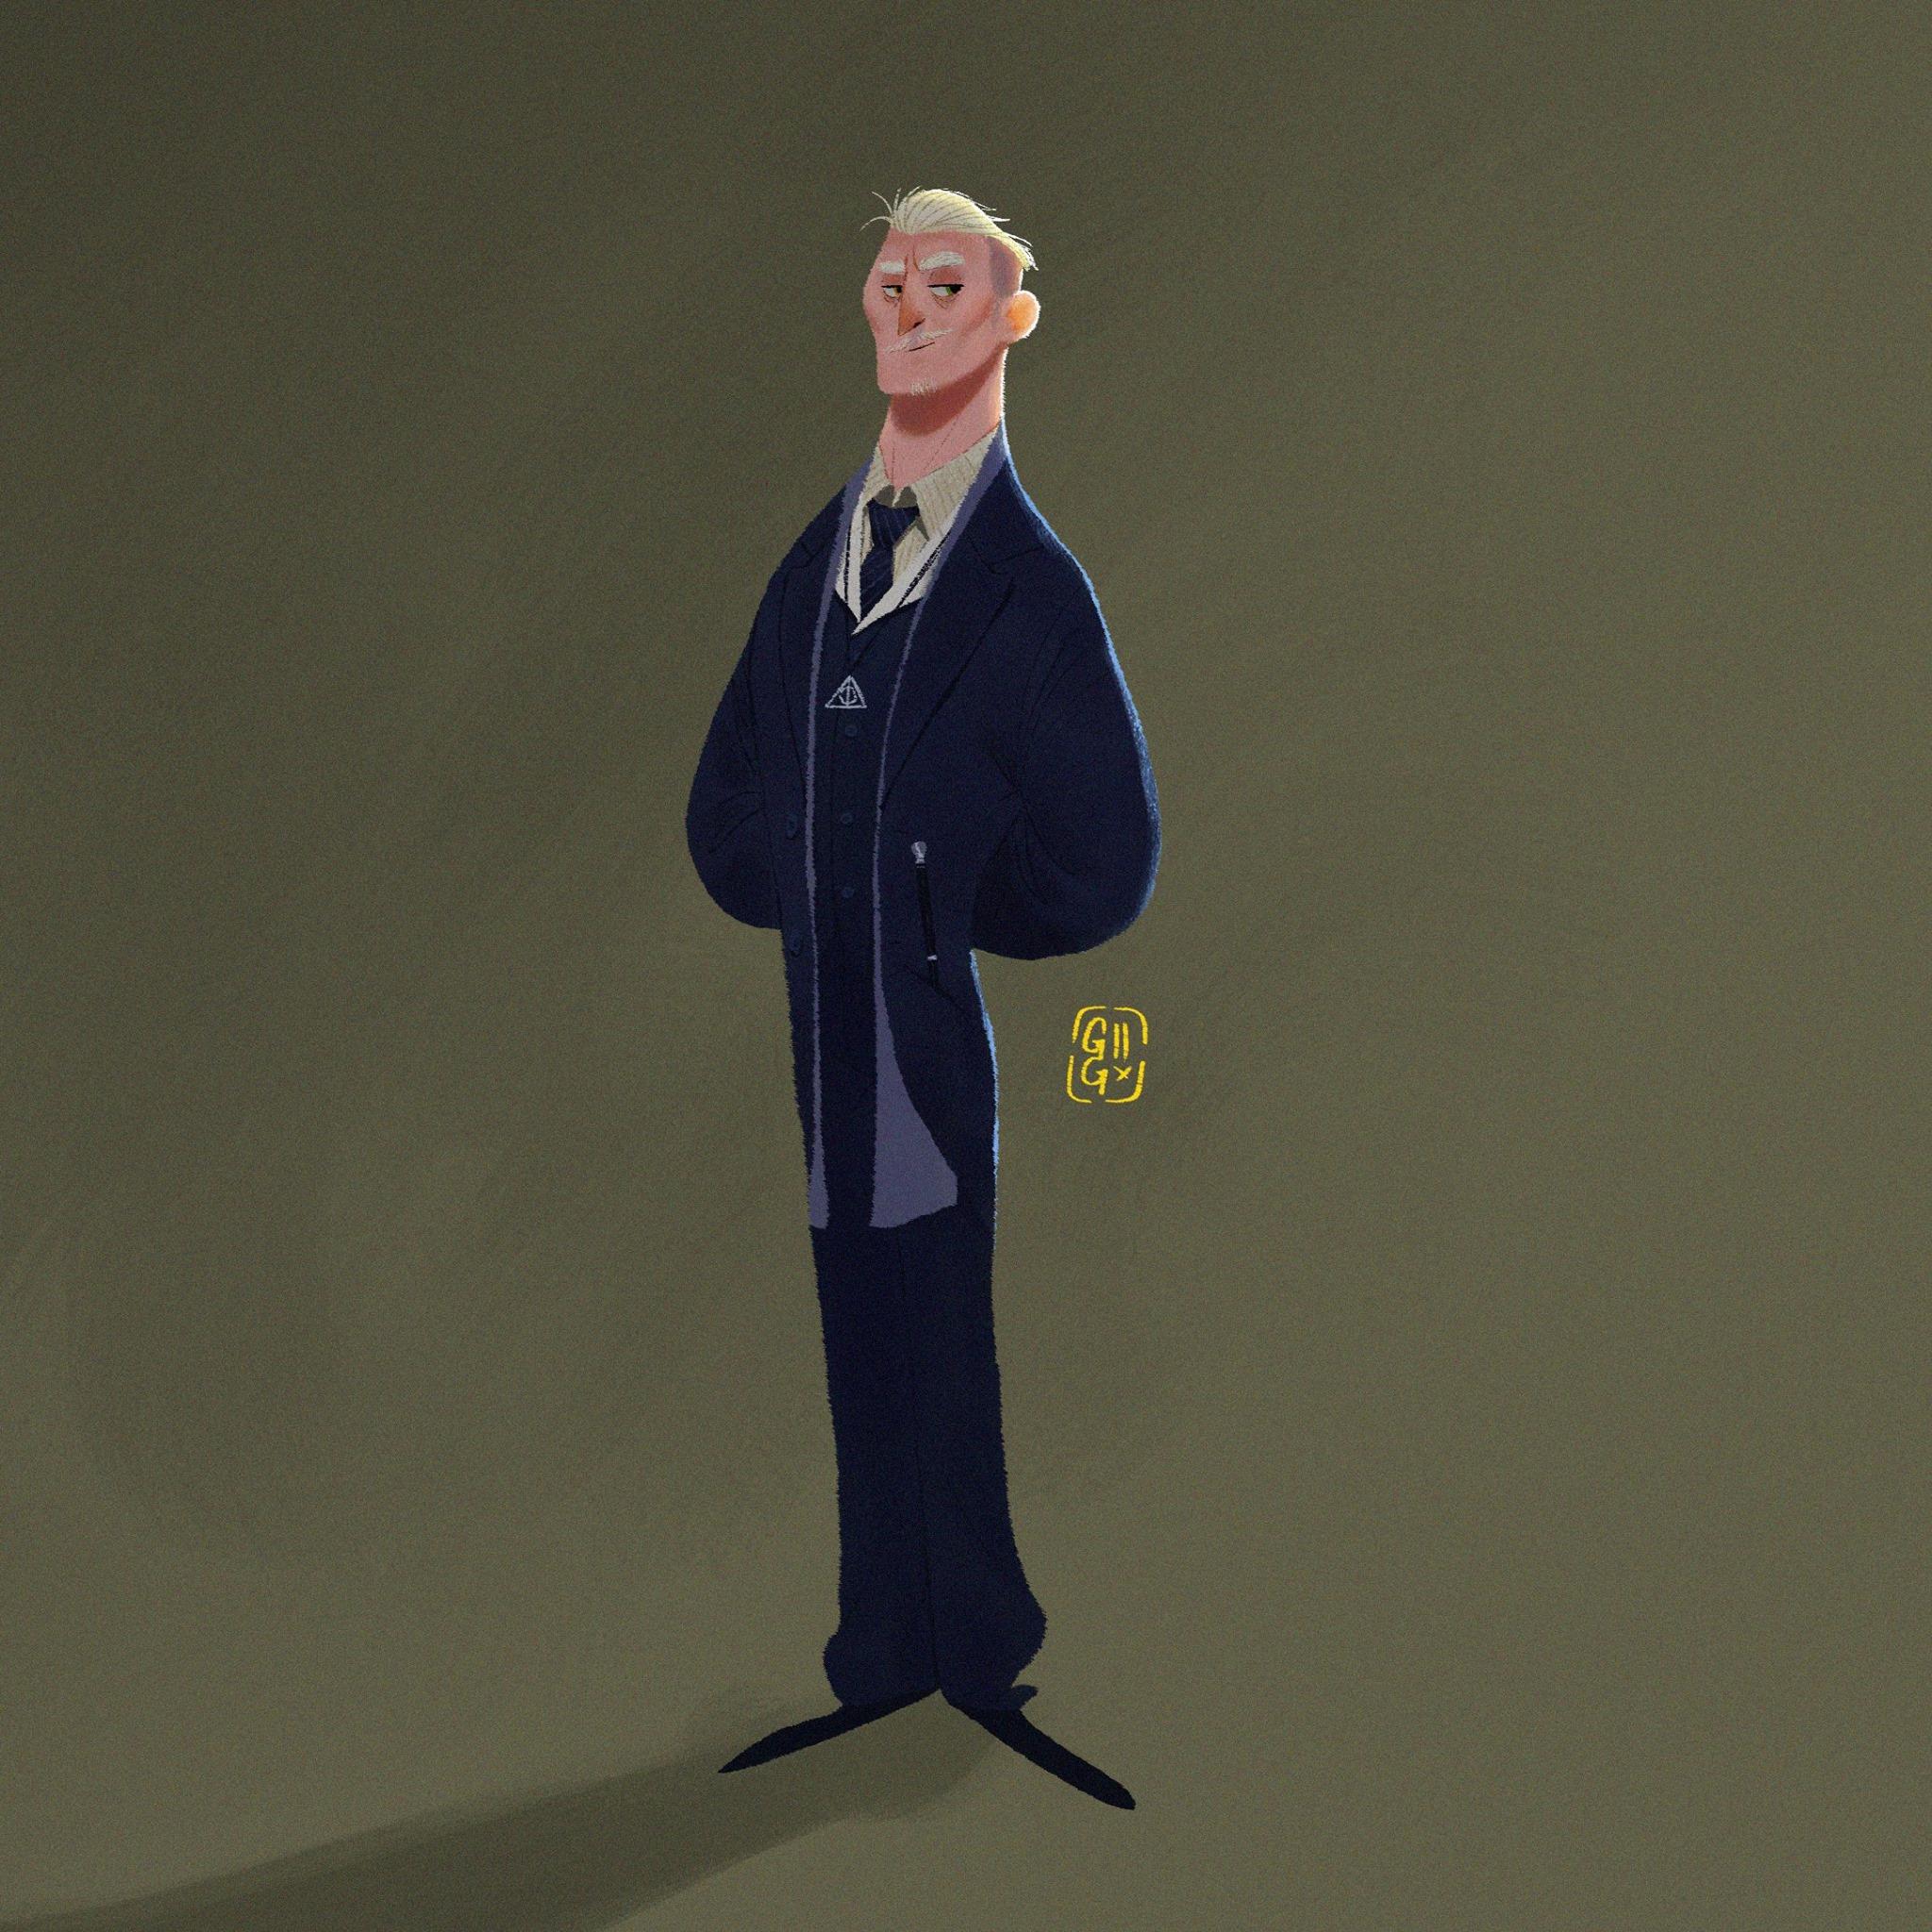 harry-potter-character-design-challenge-gellert-grindelwald-gop-gap